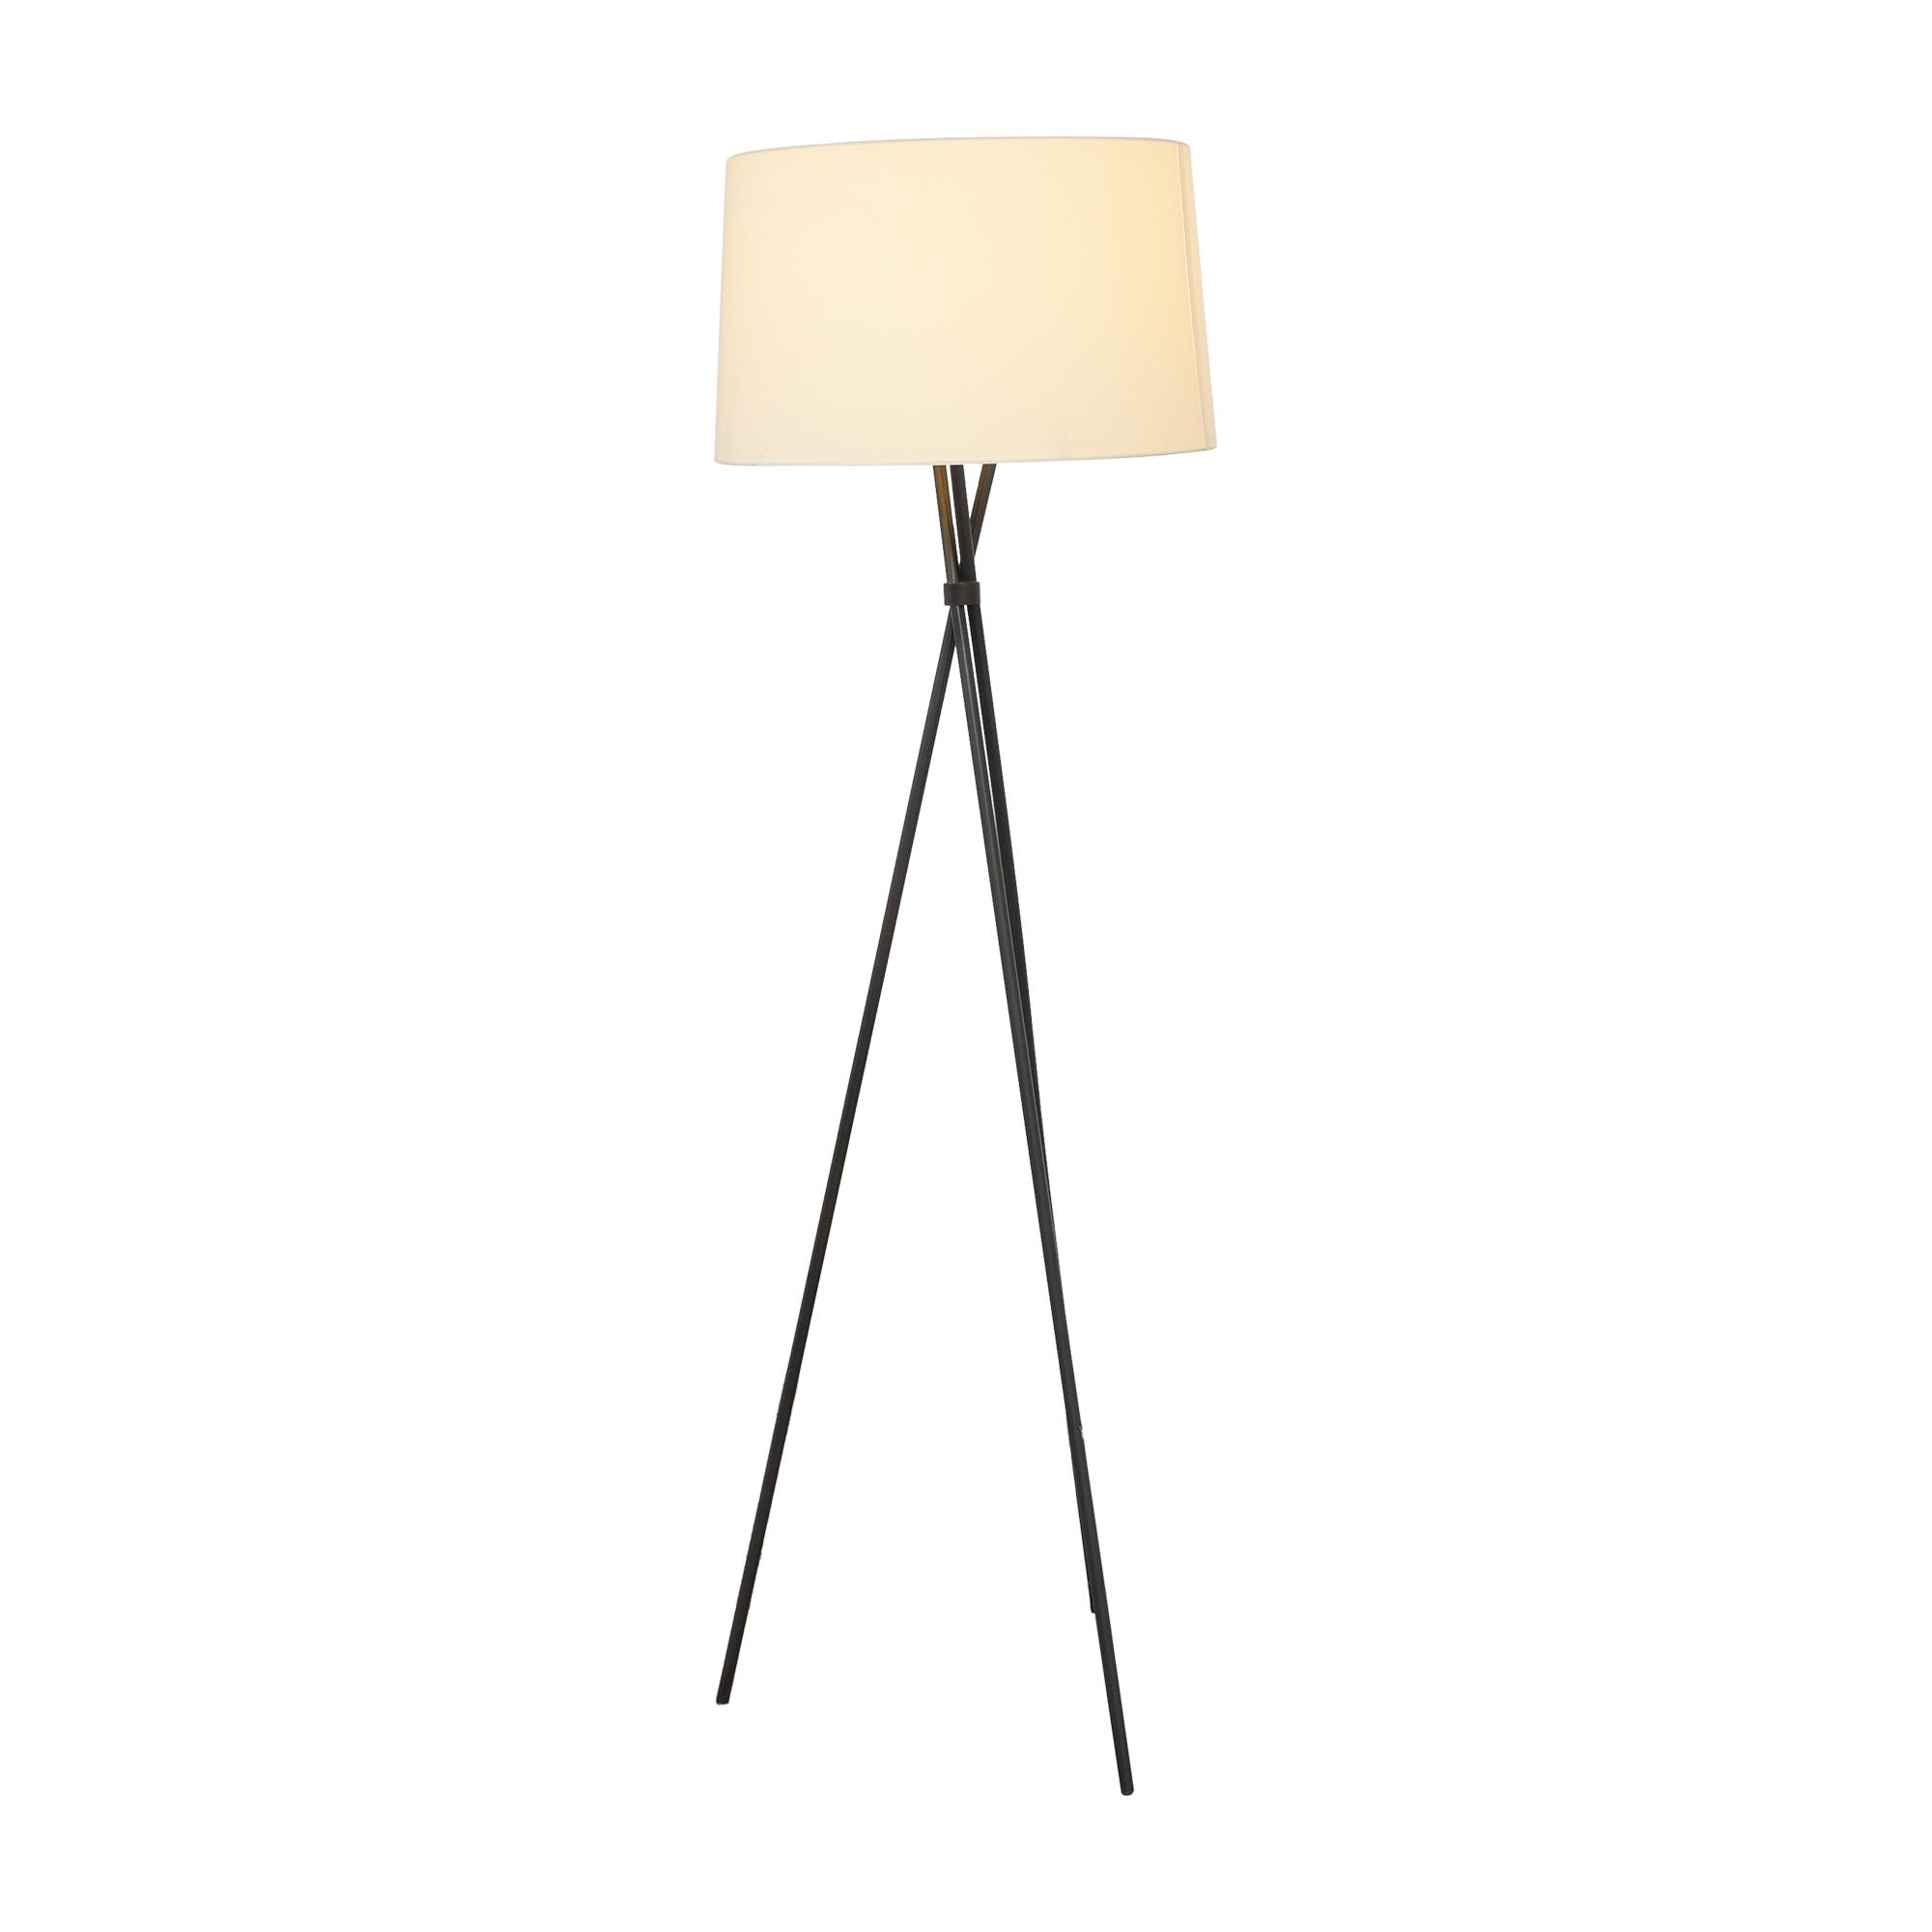 Room & Board Tri-Plex Floor Lamp sale